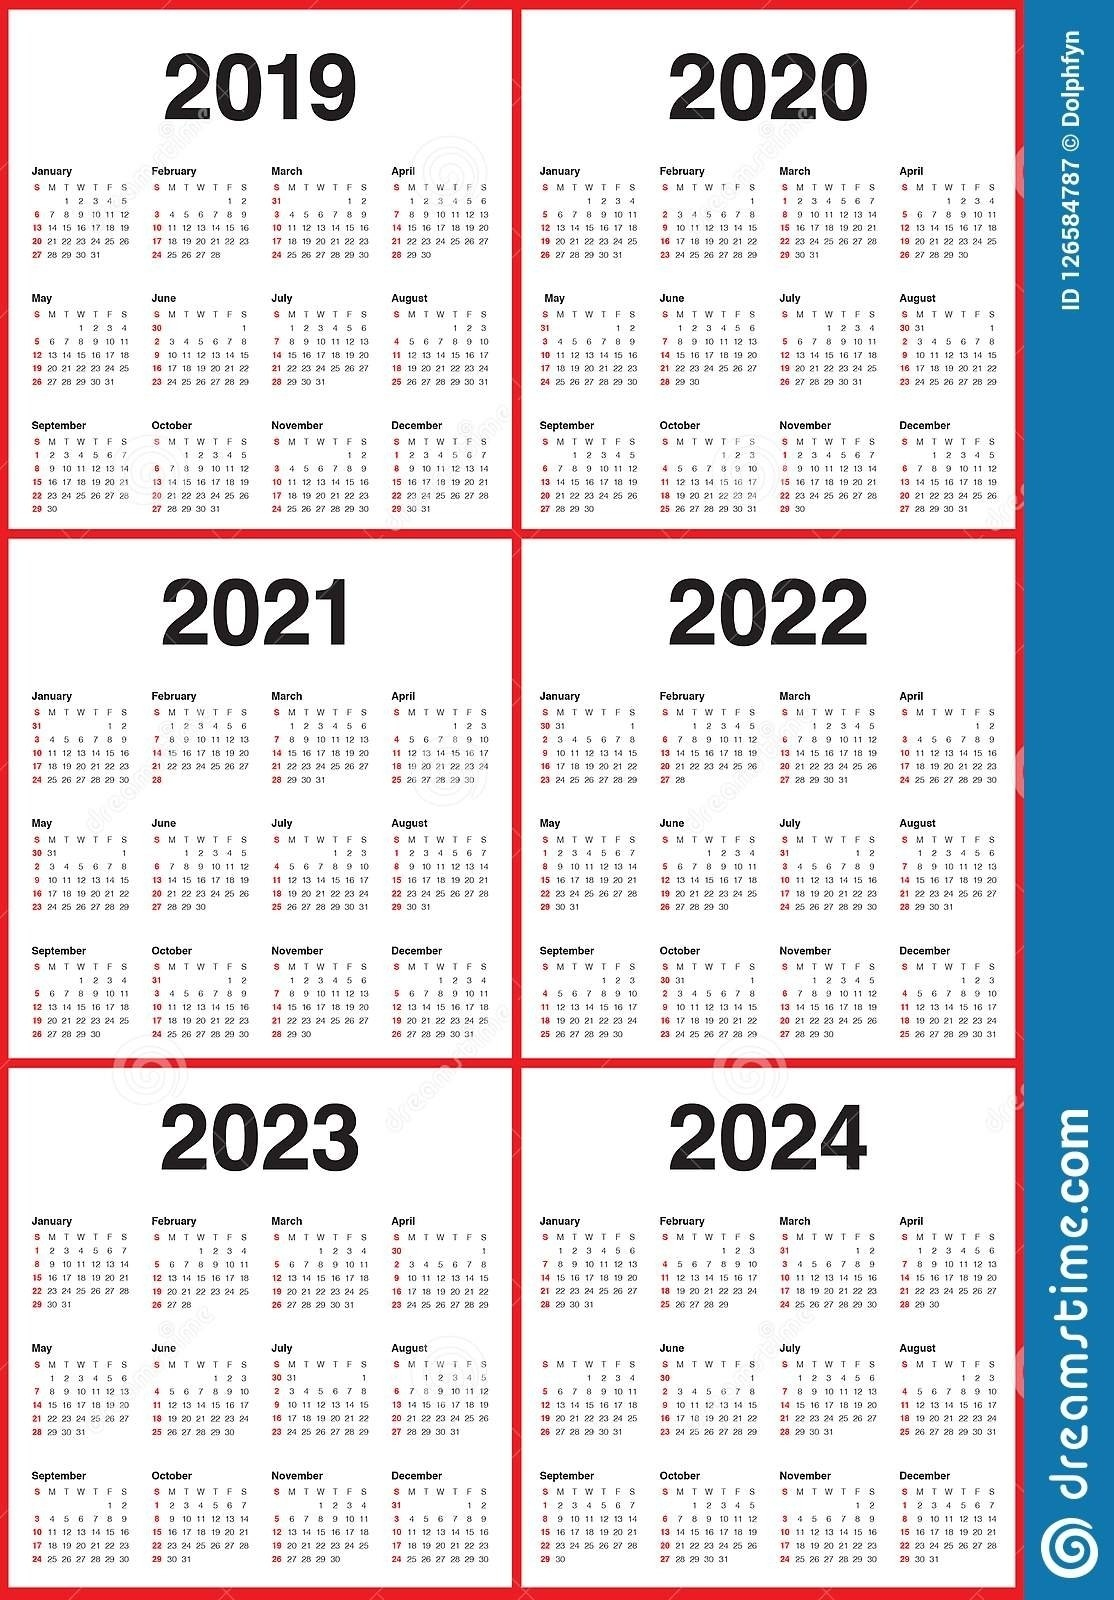 4 Year Calendar 2020 To 2023   Free Printable Calendar for 4 5 4 Calendar 2021